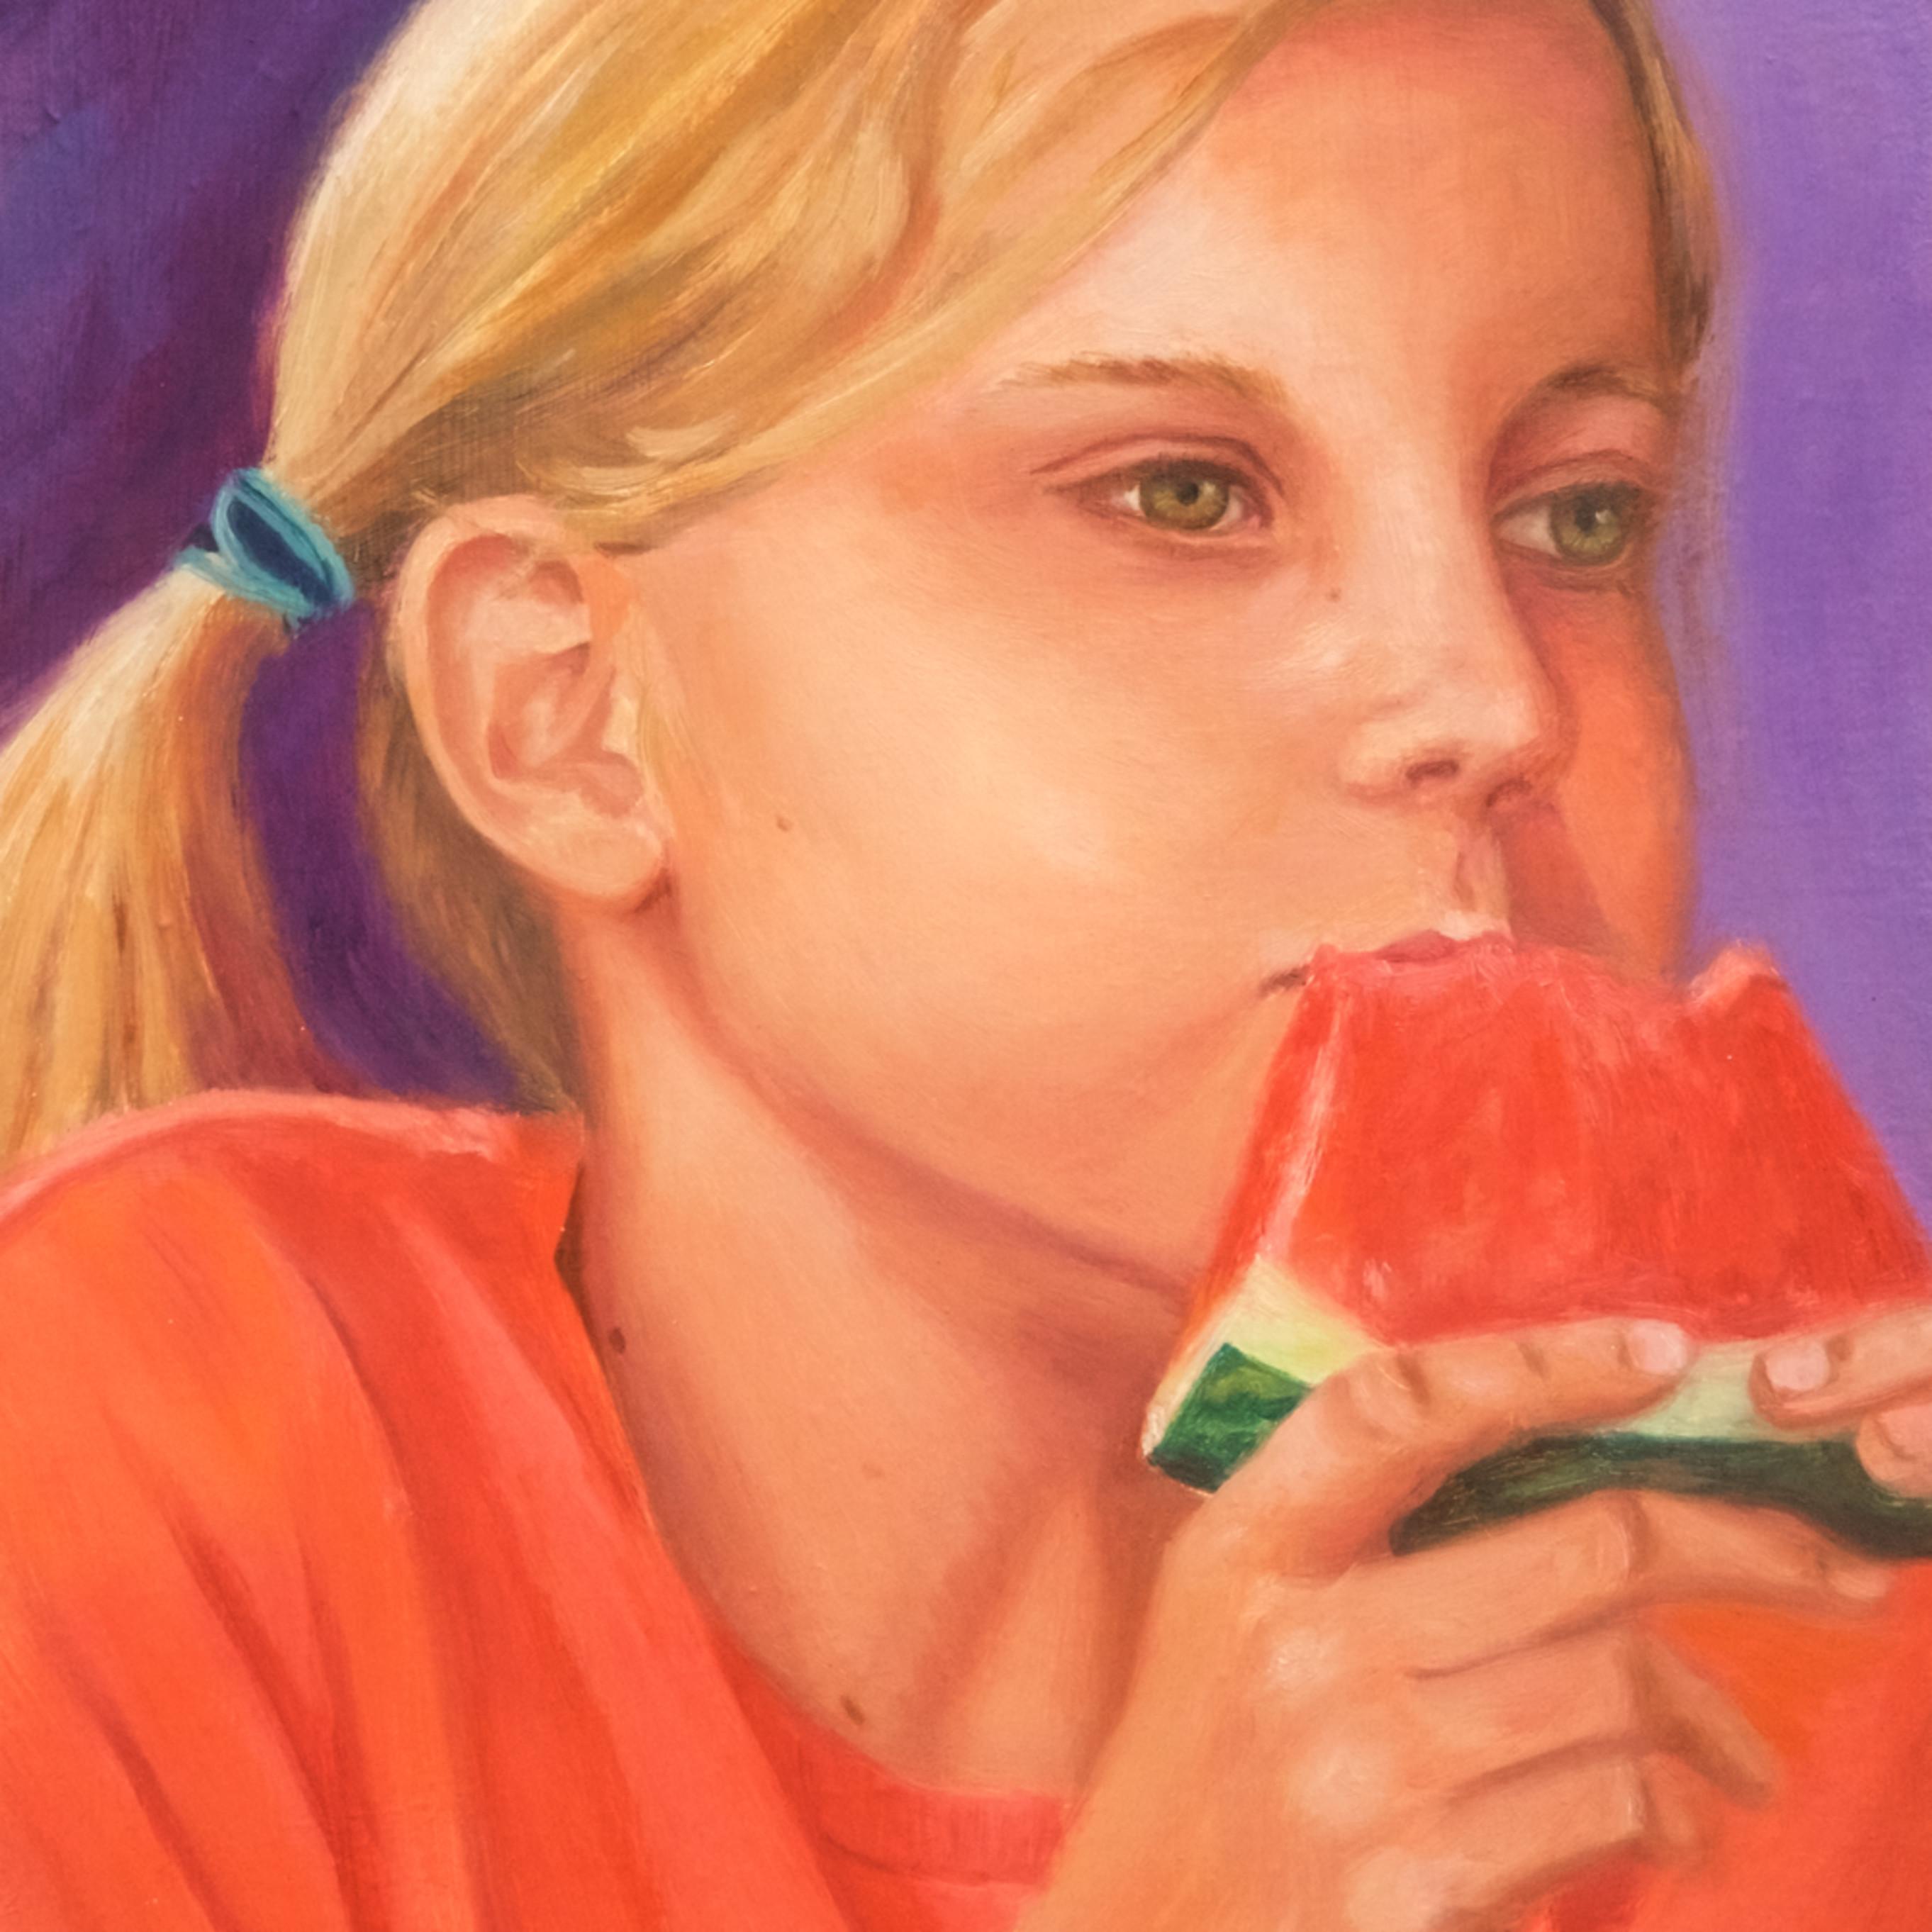 Lauren eating watermelon xyhrth